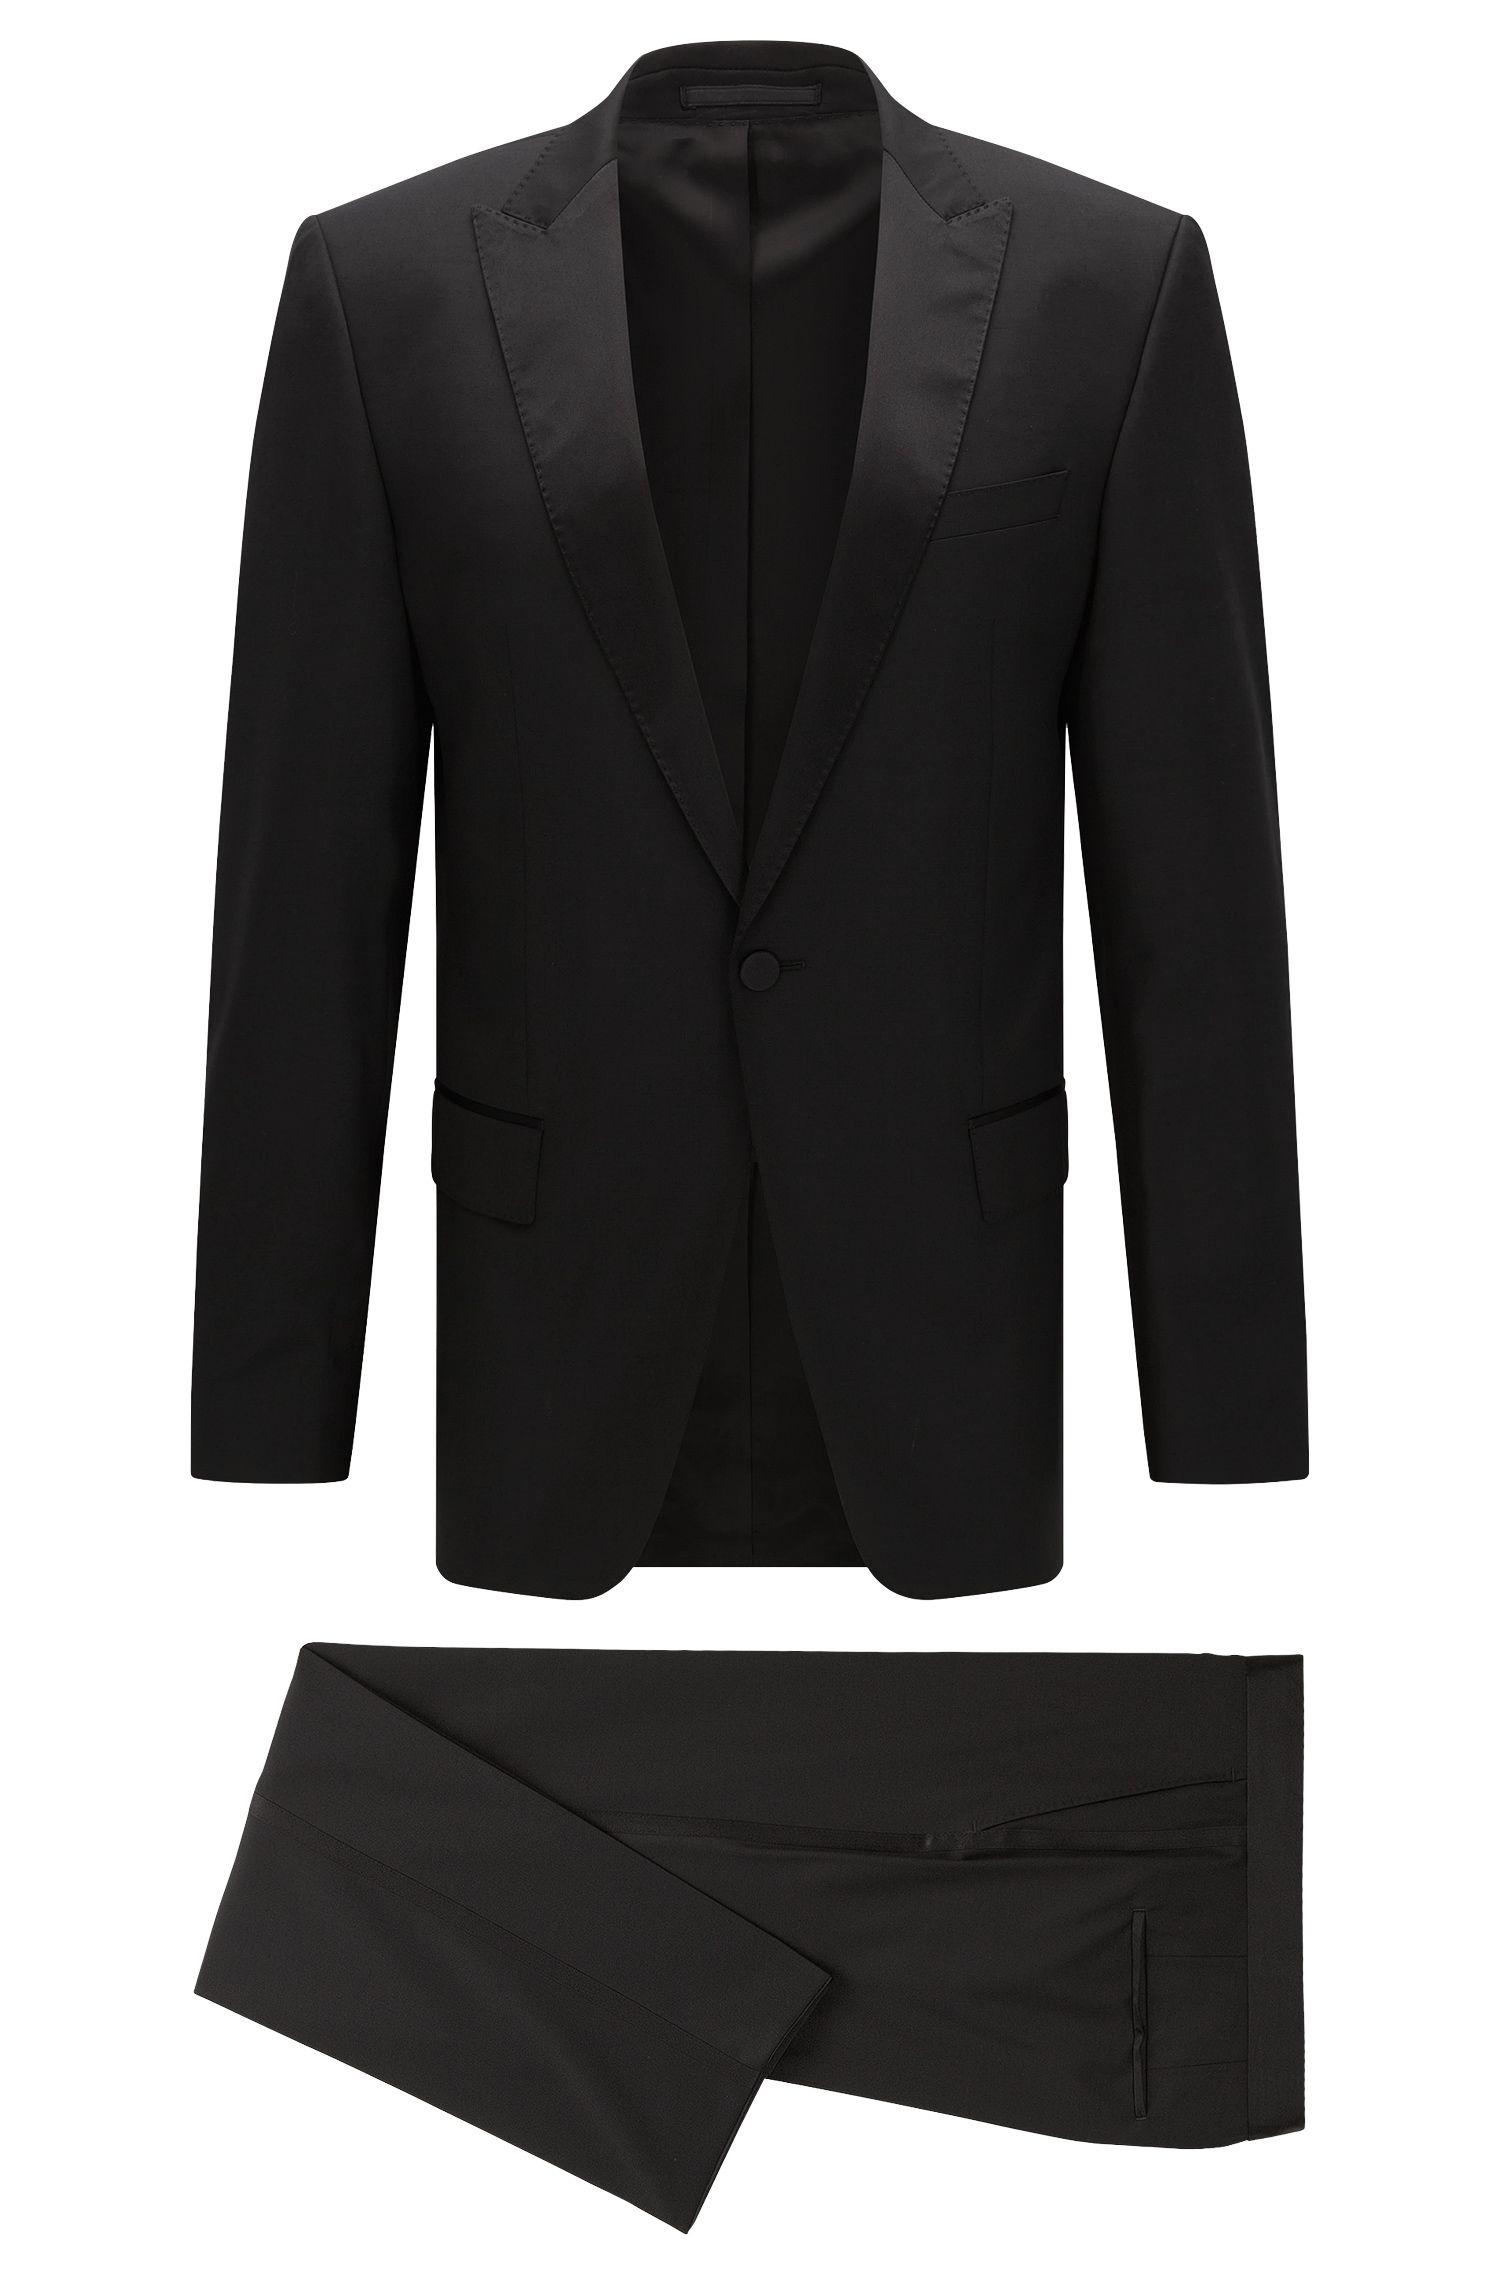 Virgin Wool Tuxedo, Slim Fit | Housten/Gloriuos